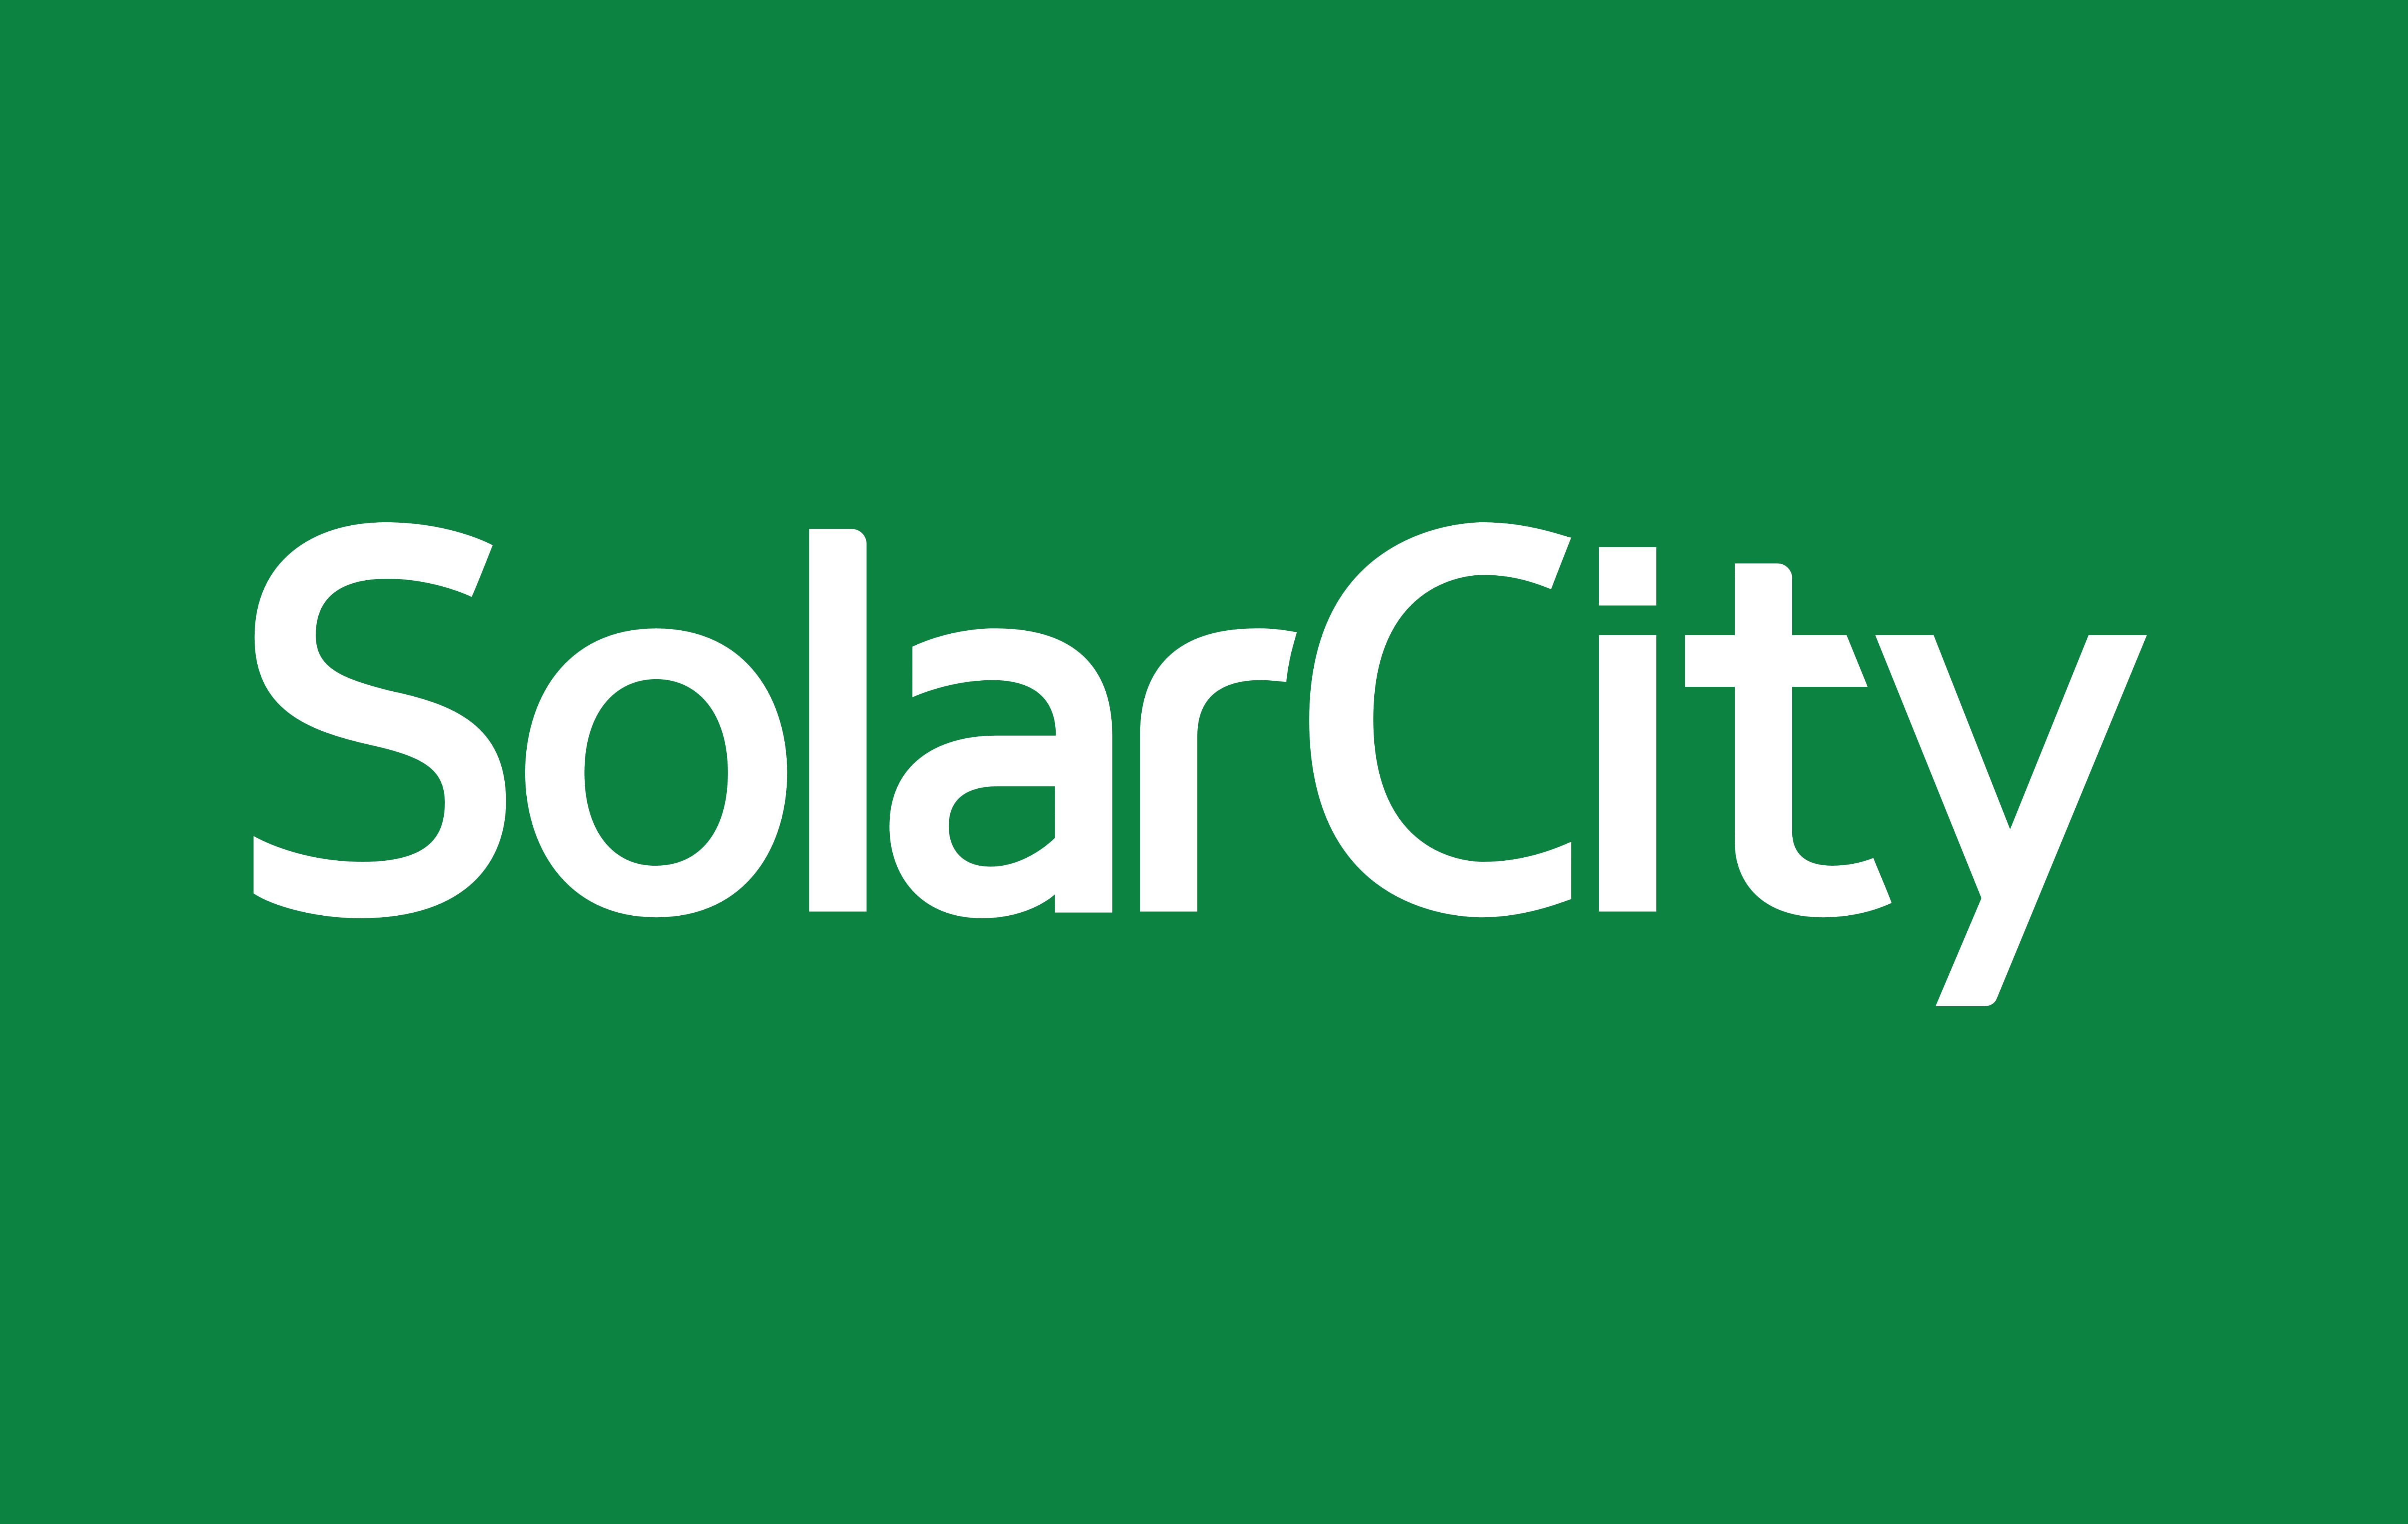 Solarcity Solar City Logos Download